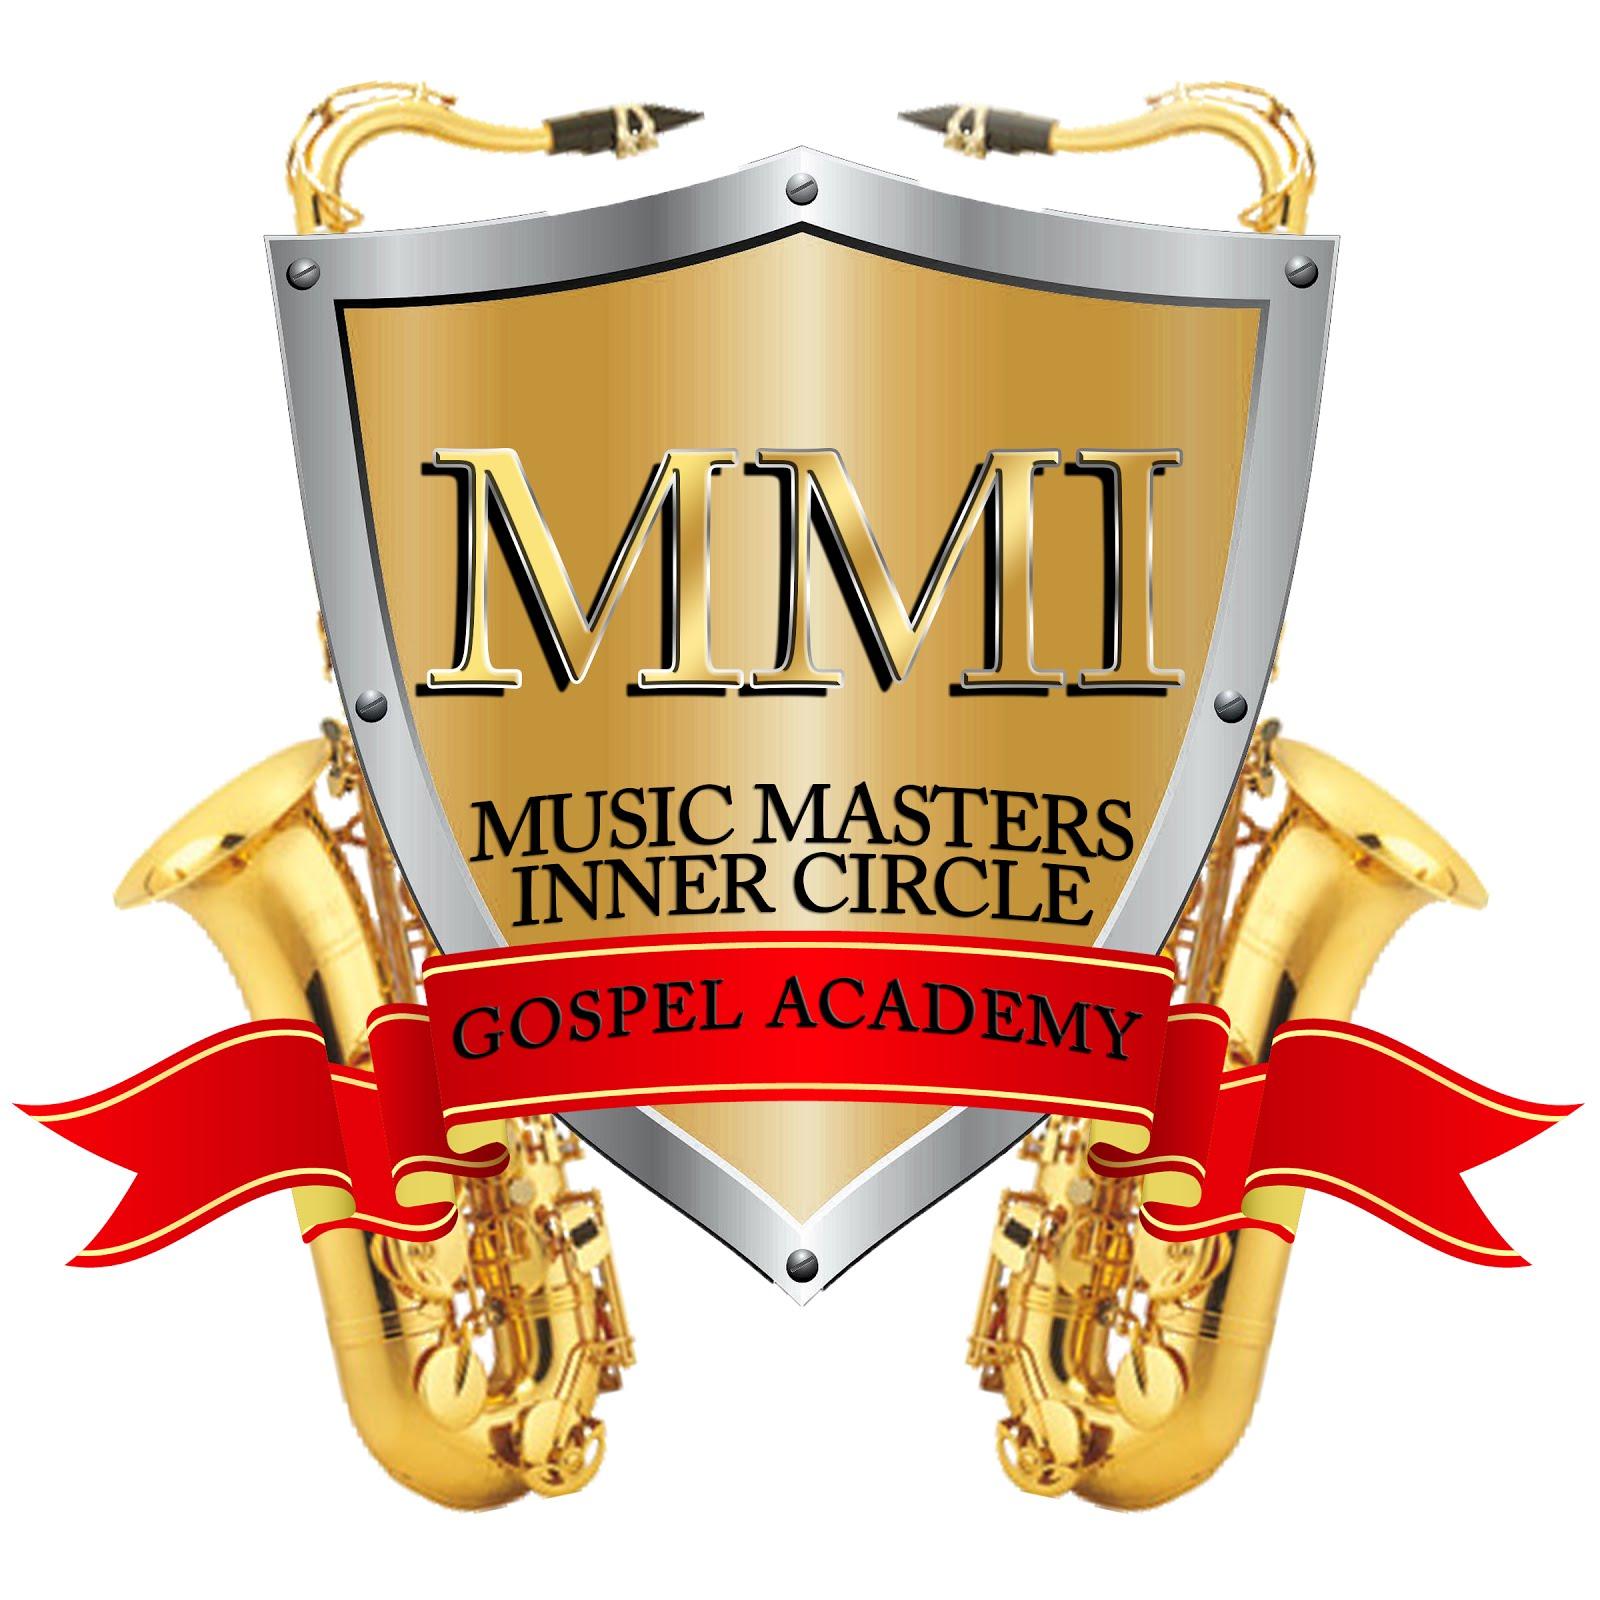 Music Masters Gospel Academy